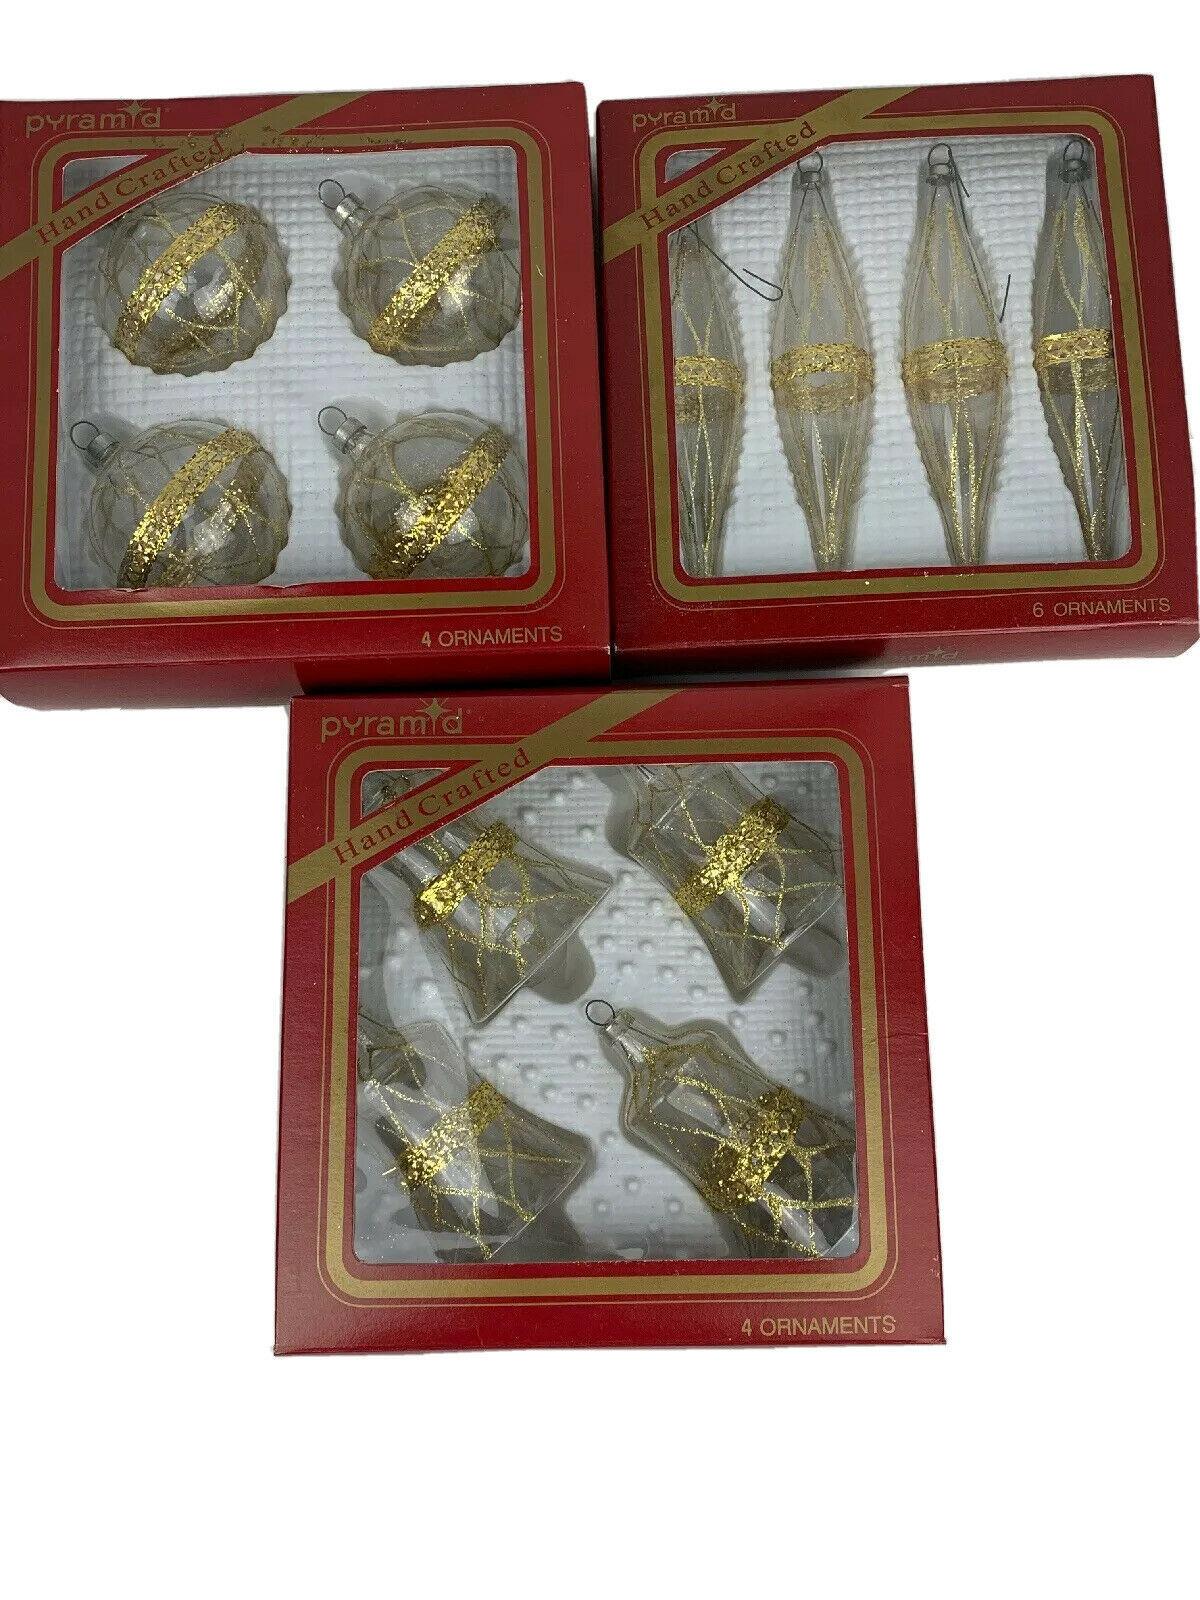 Vintage Pyramid Rauch Glass Gold Trim Christmas Ornaments Bells Teardrops - $15.80